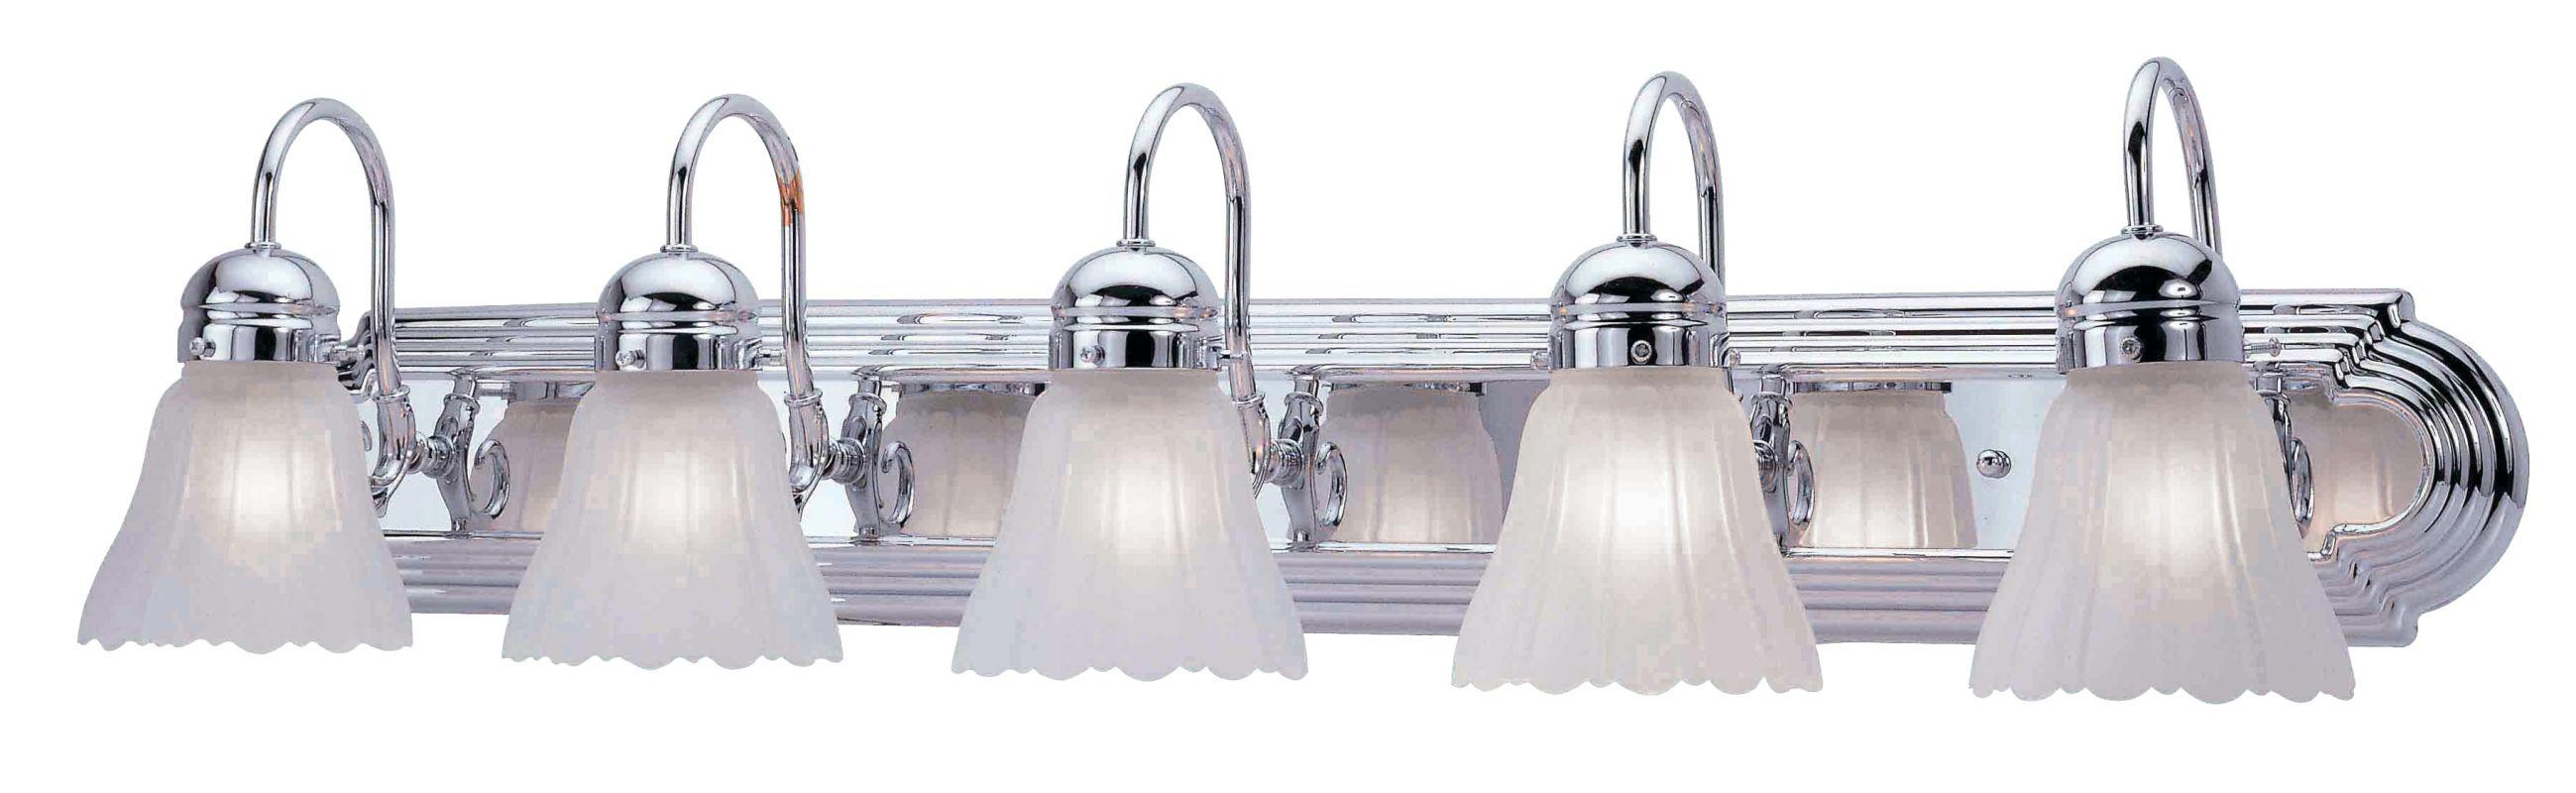 Bathroom Vanity Lights Facing Up : Livex Lighting 1105-05 Chrome Belmont 5 Light Bathroom Vanity Light - LightingDirect.com